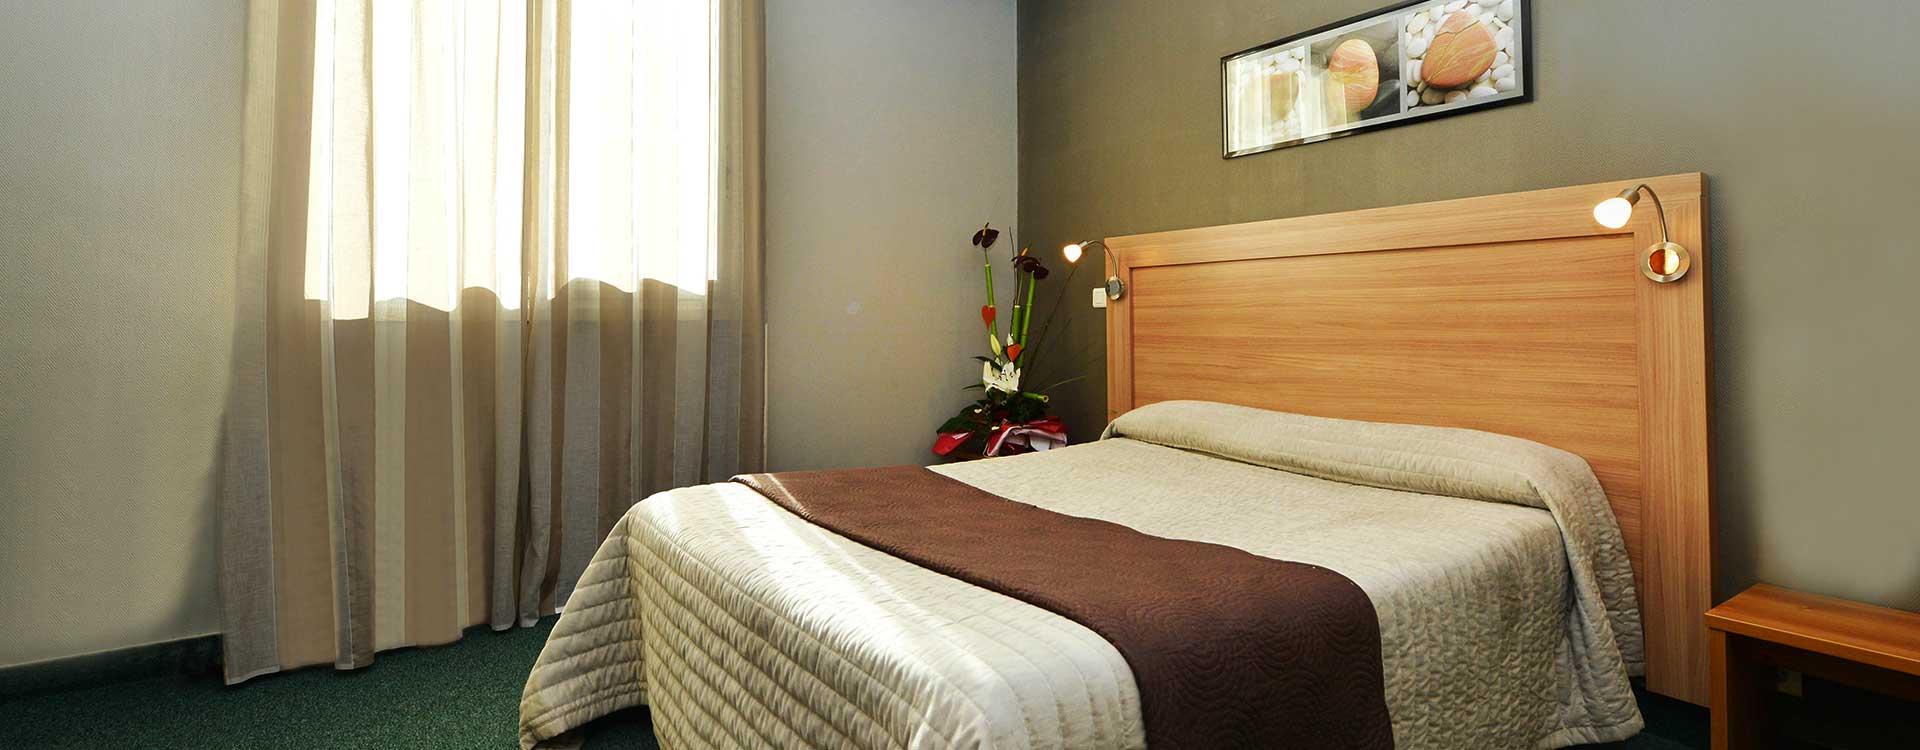 chambre standard hotel du midi rodez. Black Bedroom Furniture Sets. Home Design Ideas